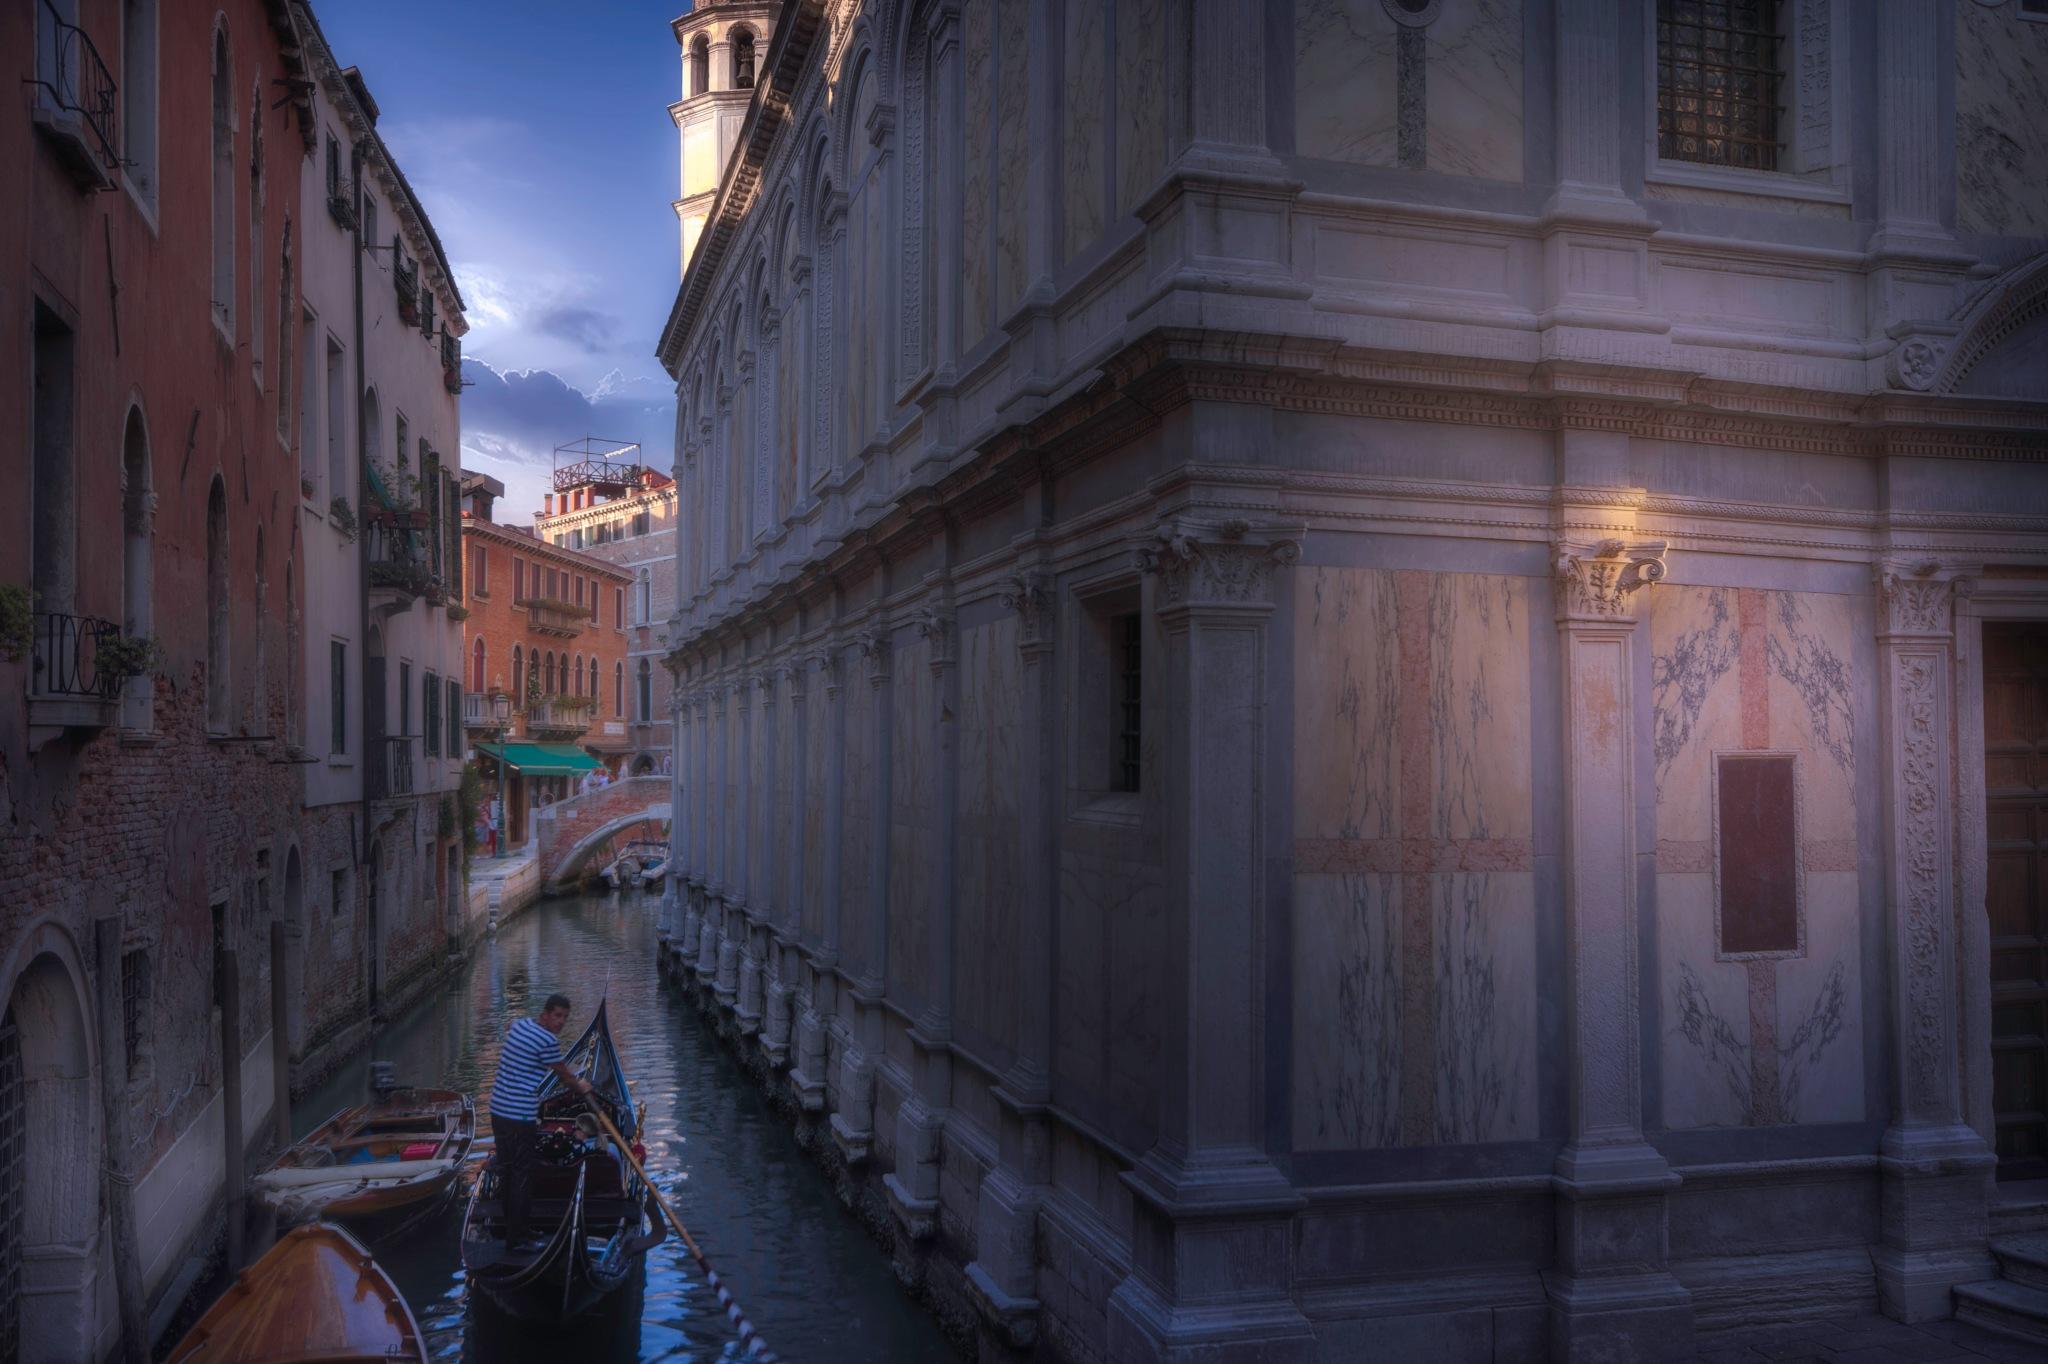 Venetian paths 100(Santa Maria dei Miracoli) by mauriziofecchio